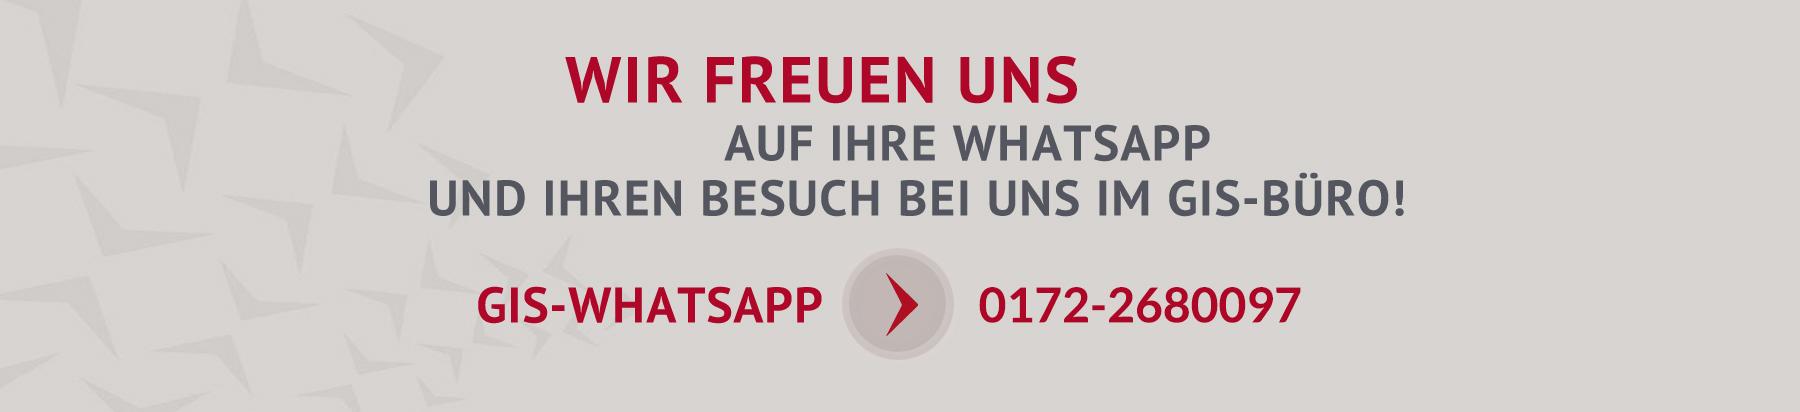 Telefonnnummer GIS Personallogistik Whatsapp